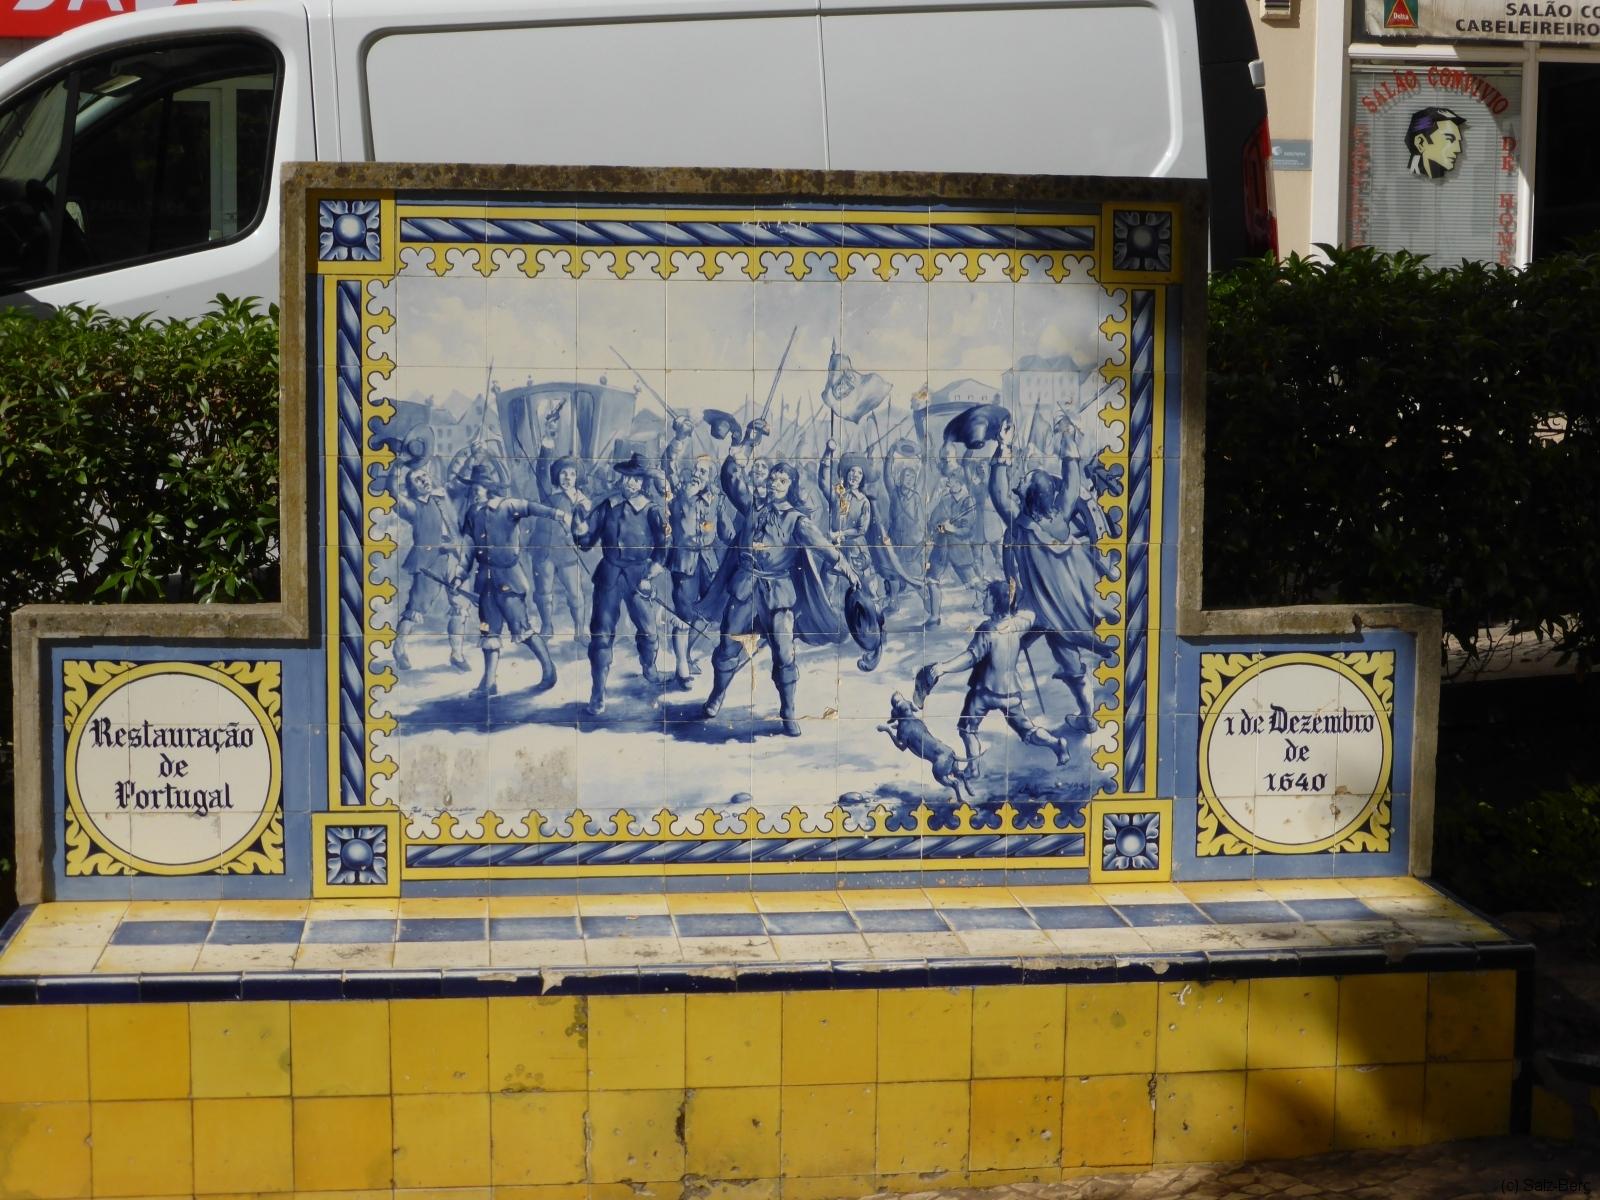 Algarve-135f-P1050705